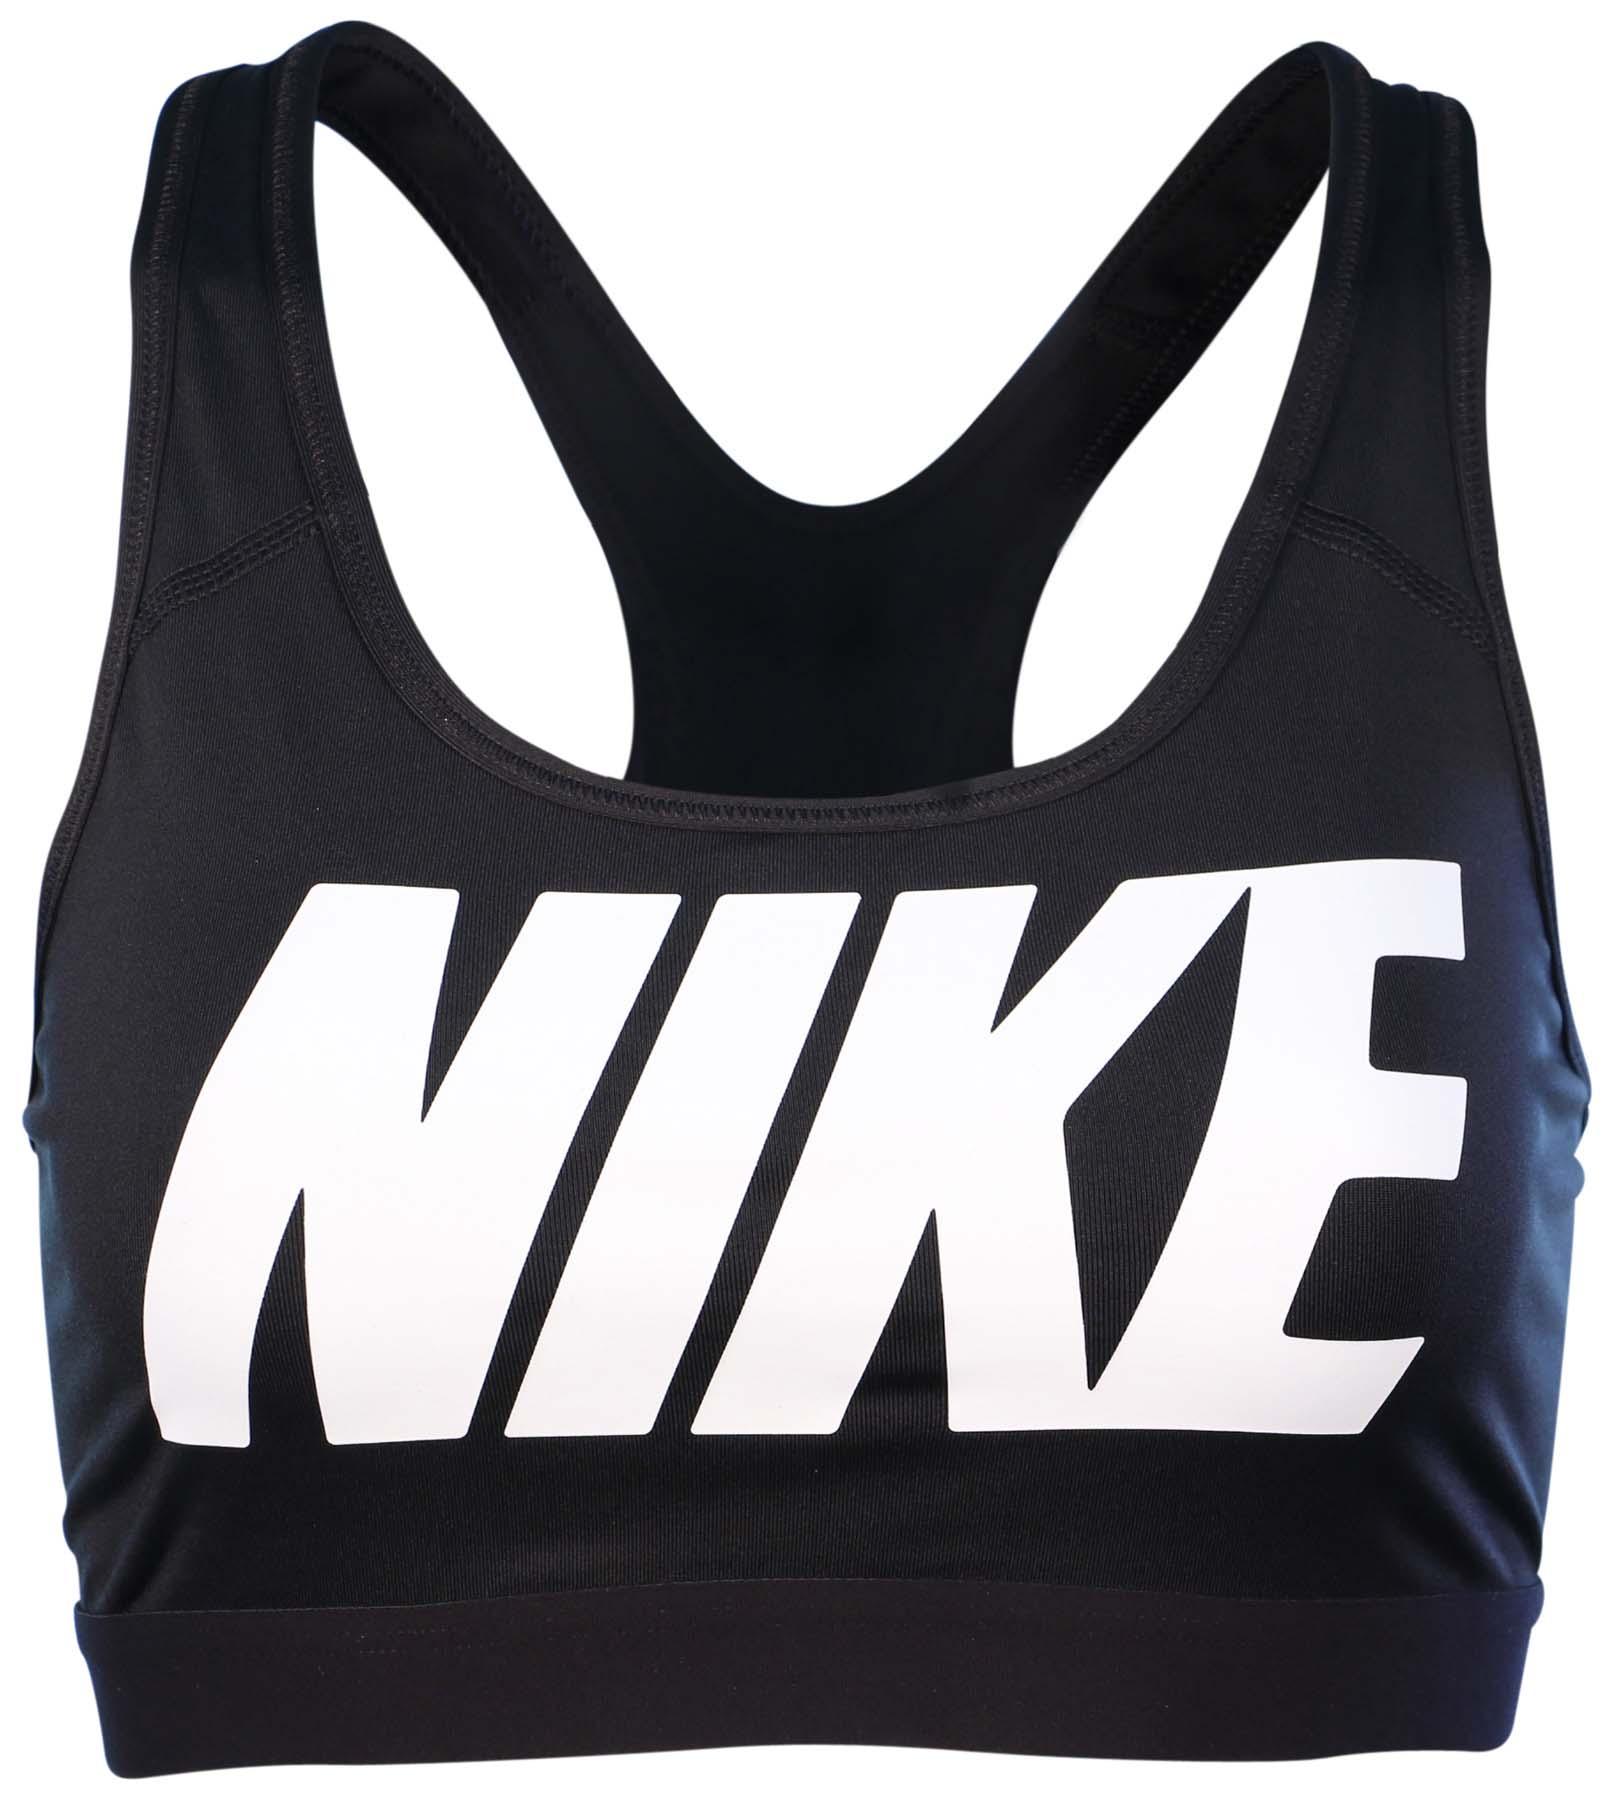 c58f1cdd275 Nike Women s Pro Classic Logo Sports Bra-Black - Walmart.com